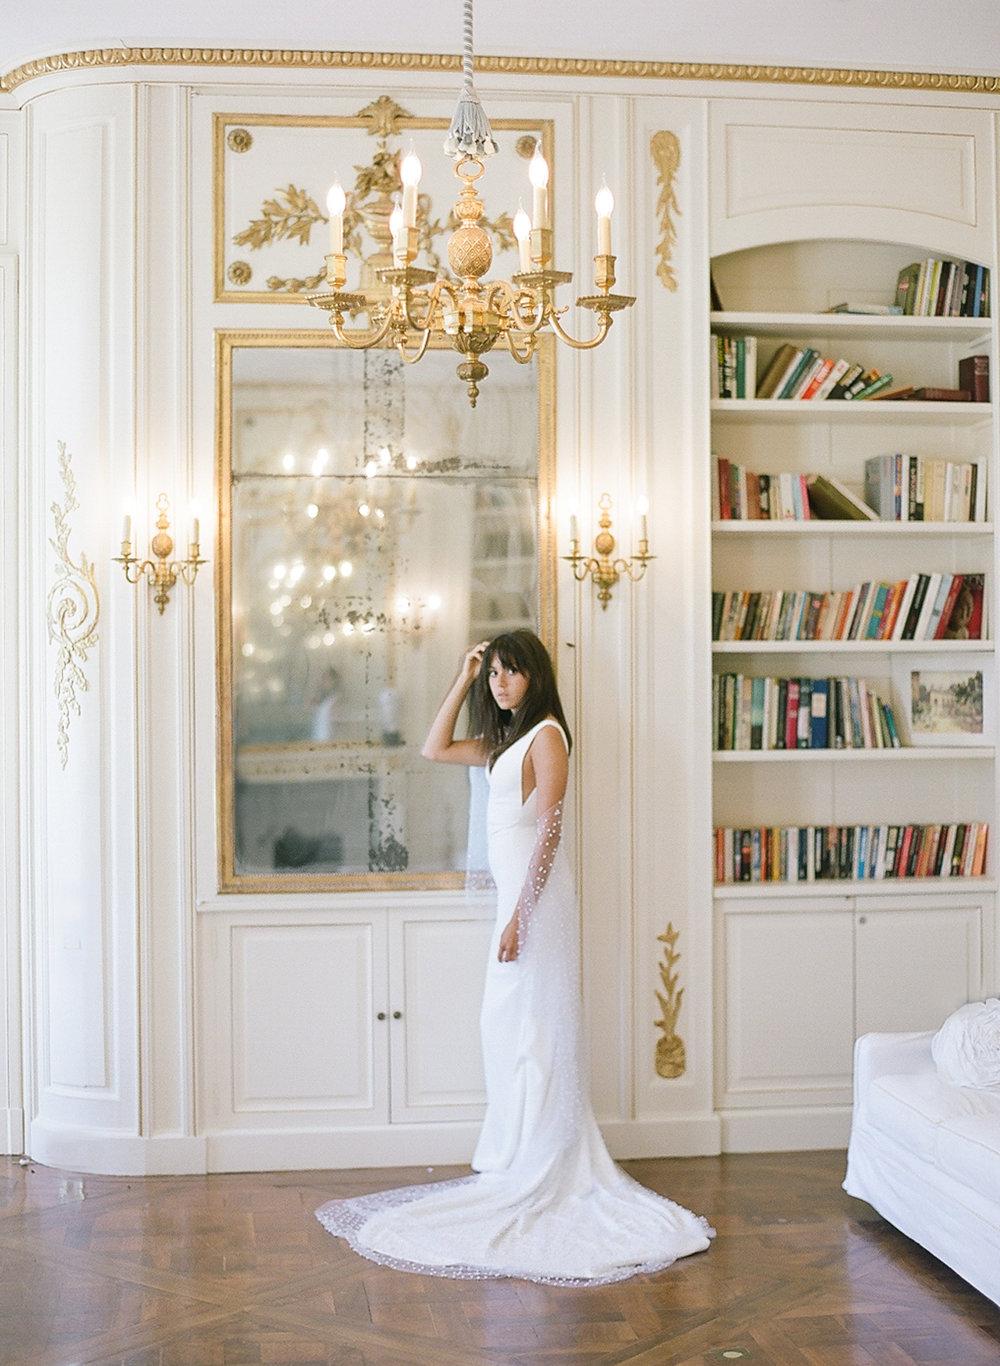 Bonphotage Paris and Provence Fine Art Wedding Photography